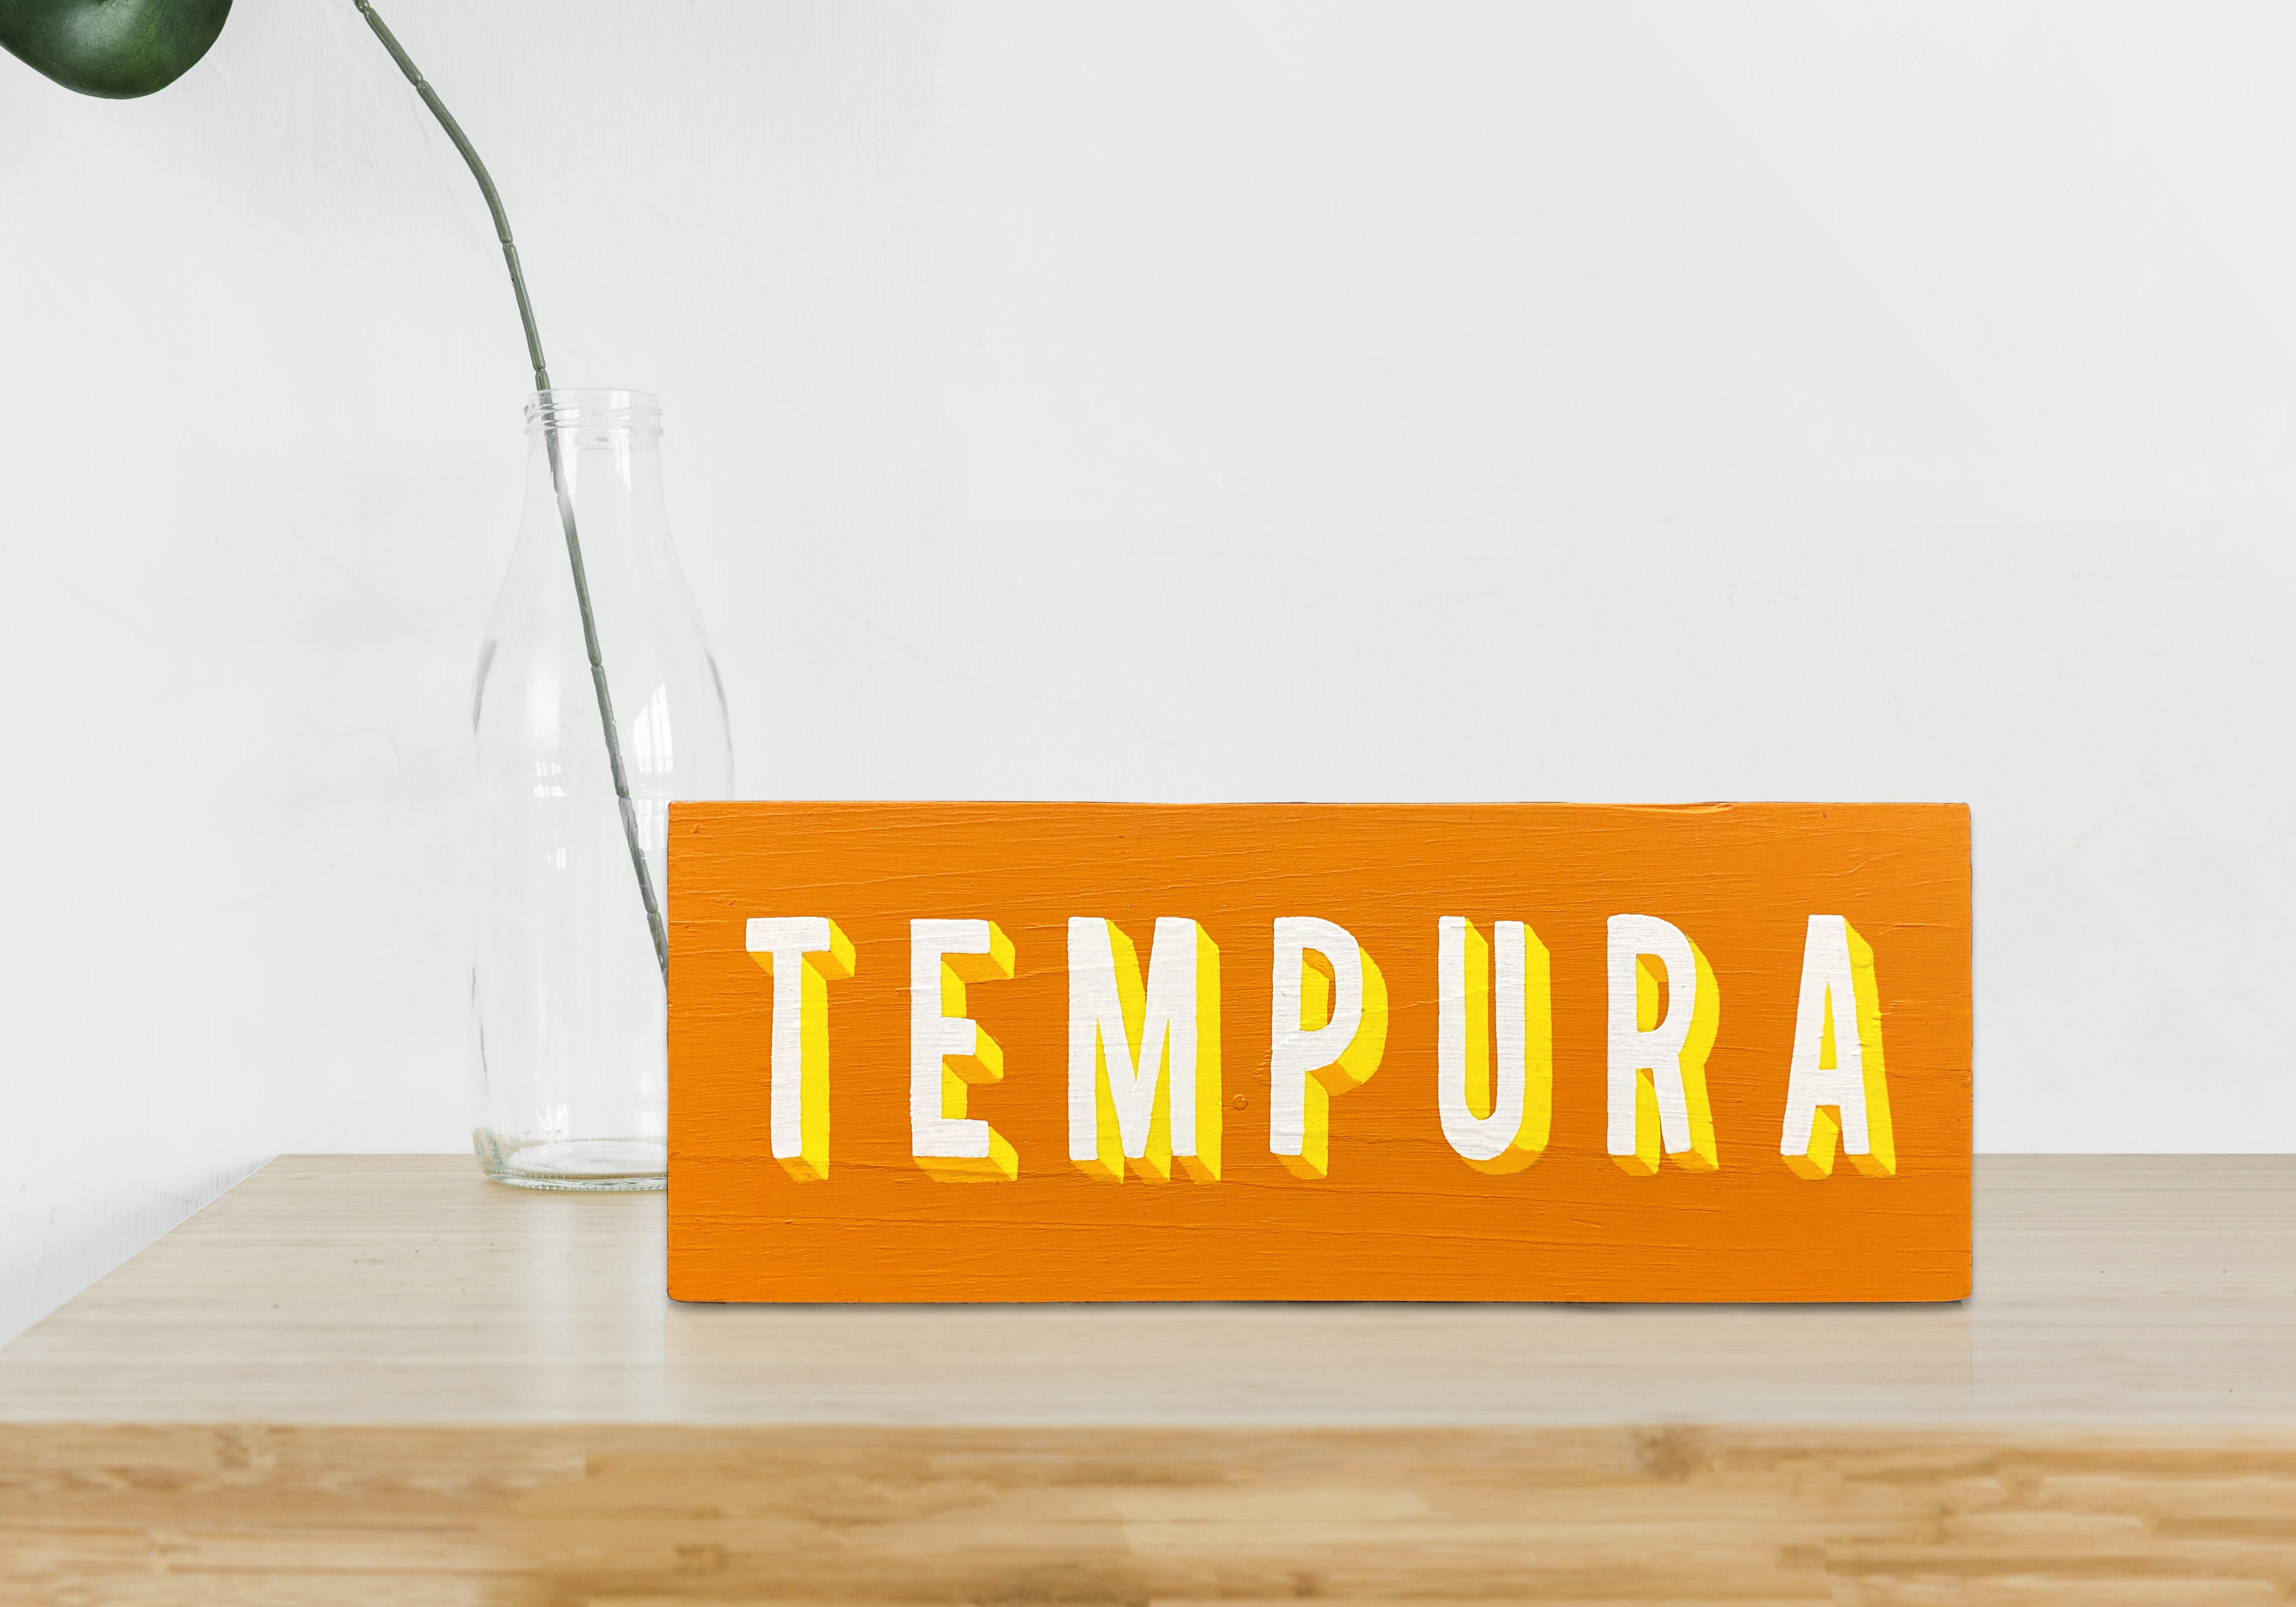 TEMPURA WOOD SIGN 100€